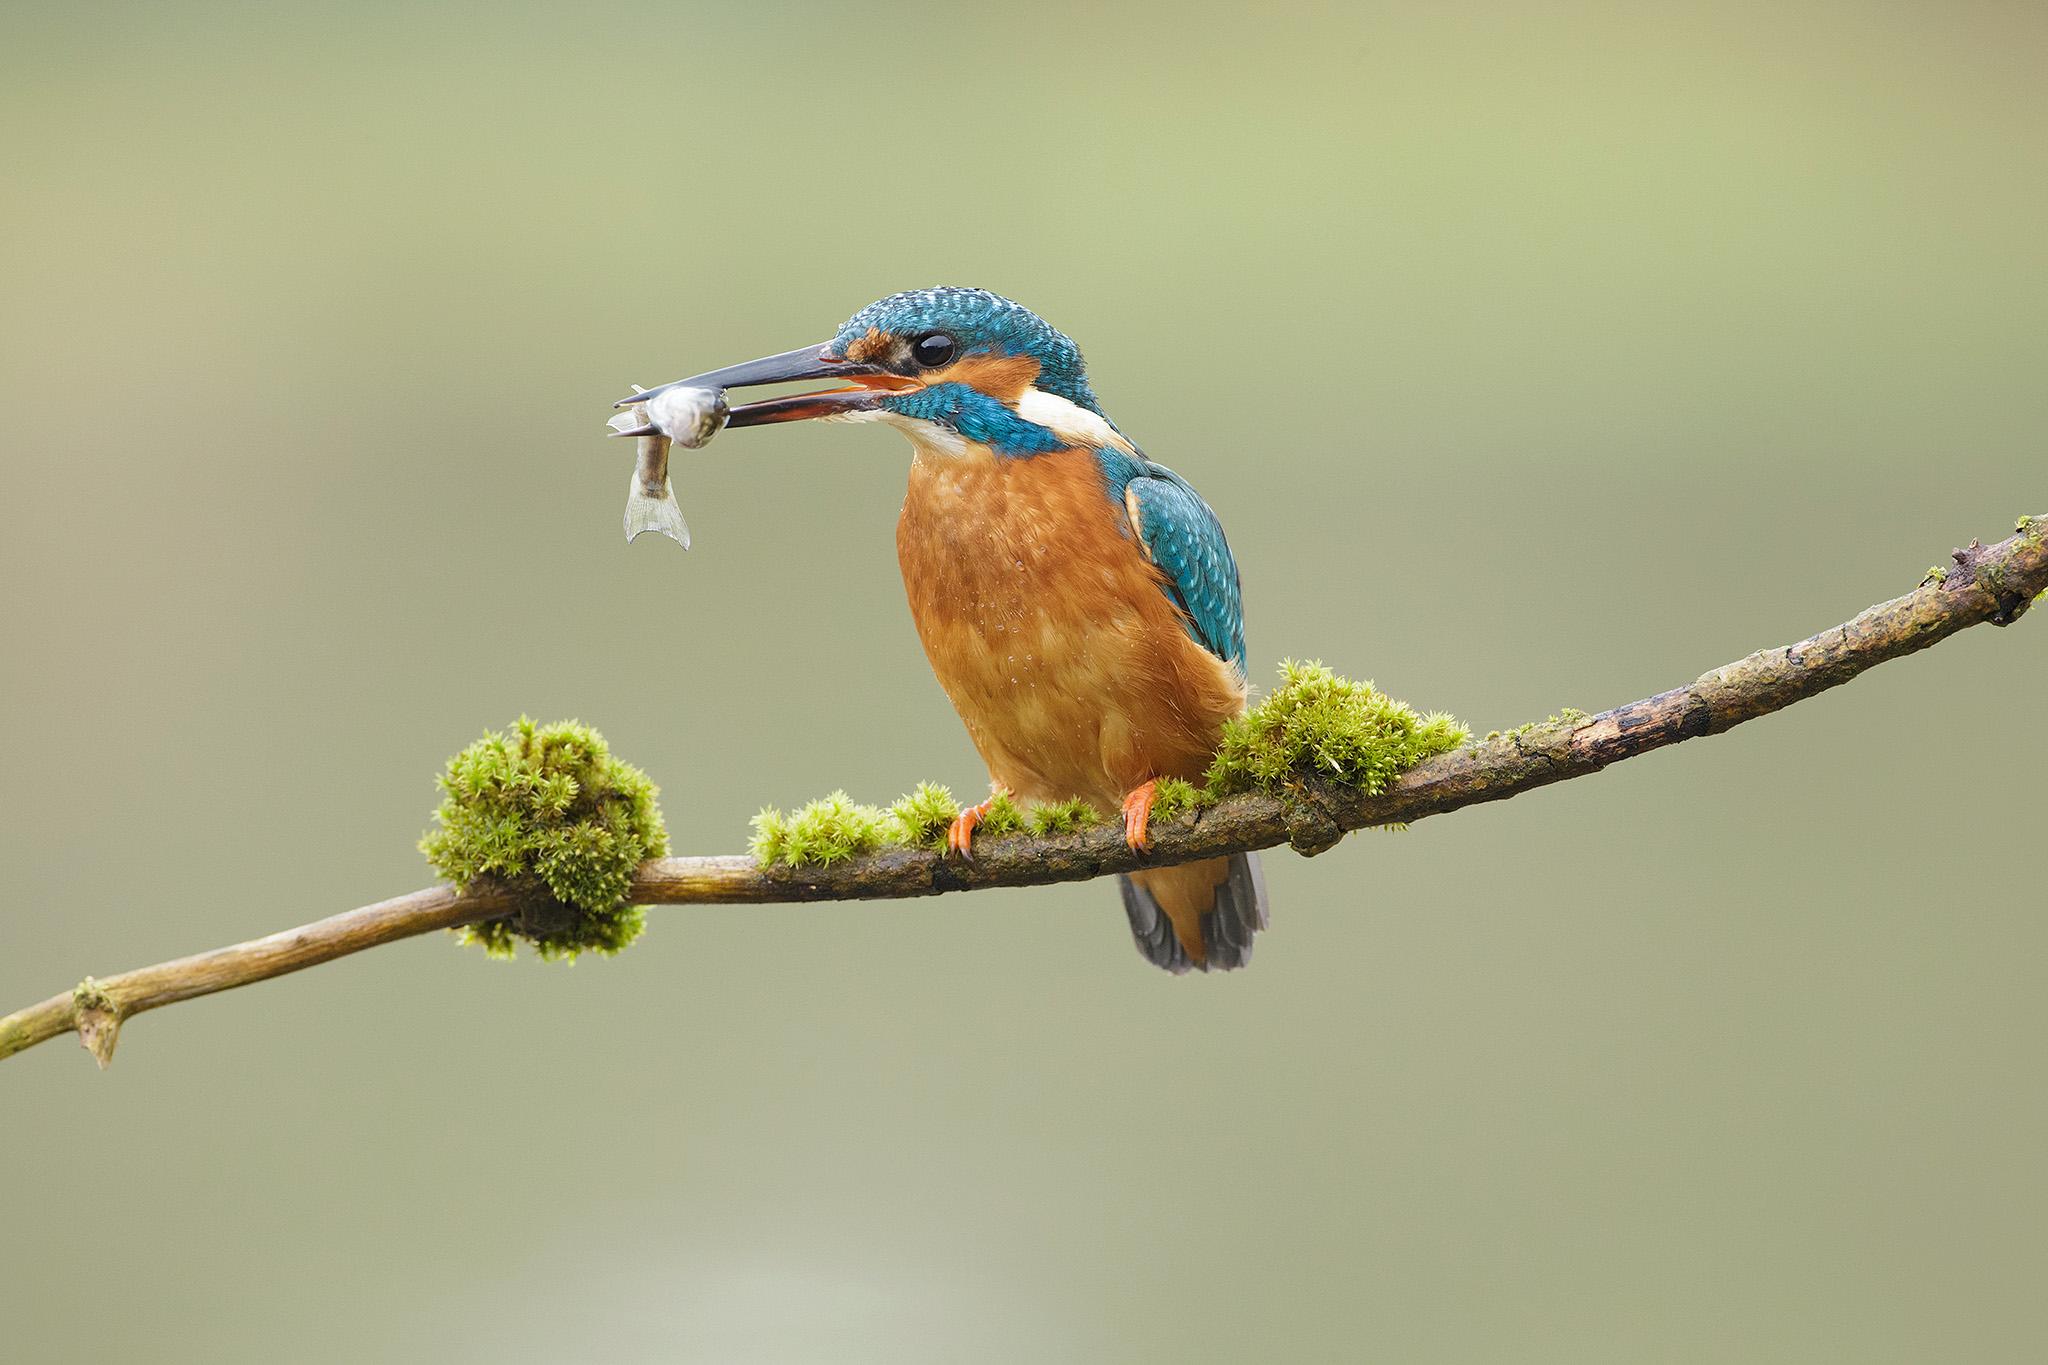 kingfisherengland